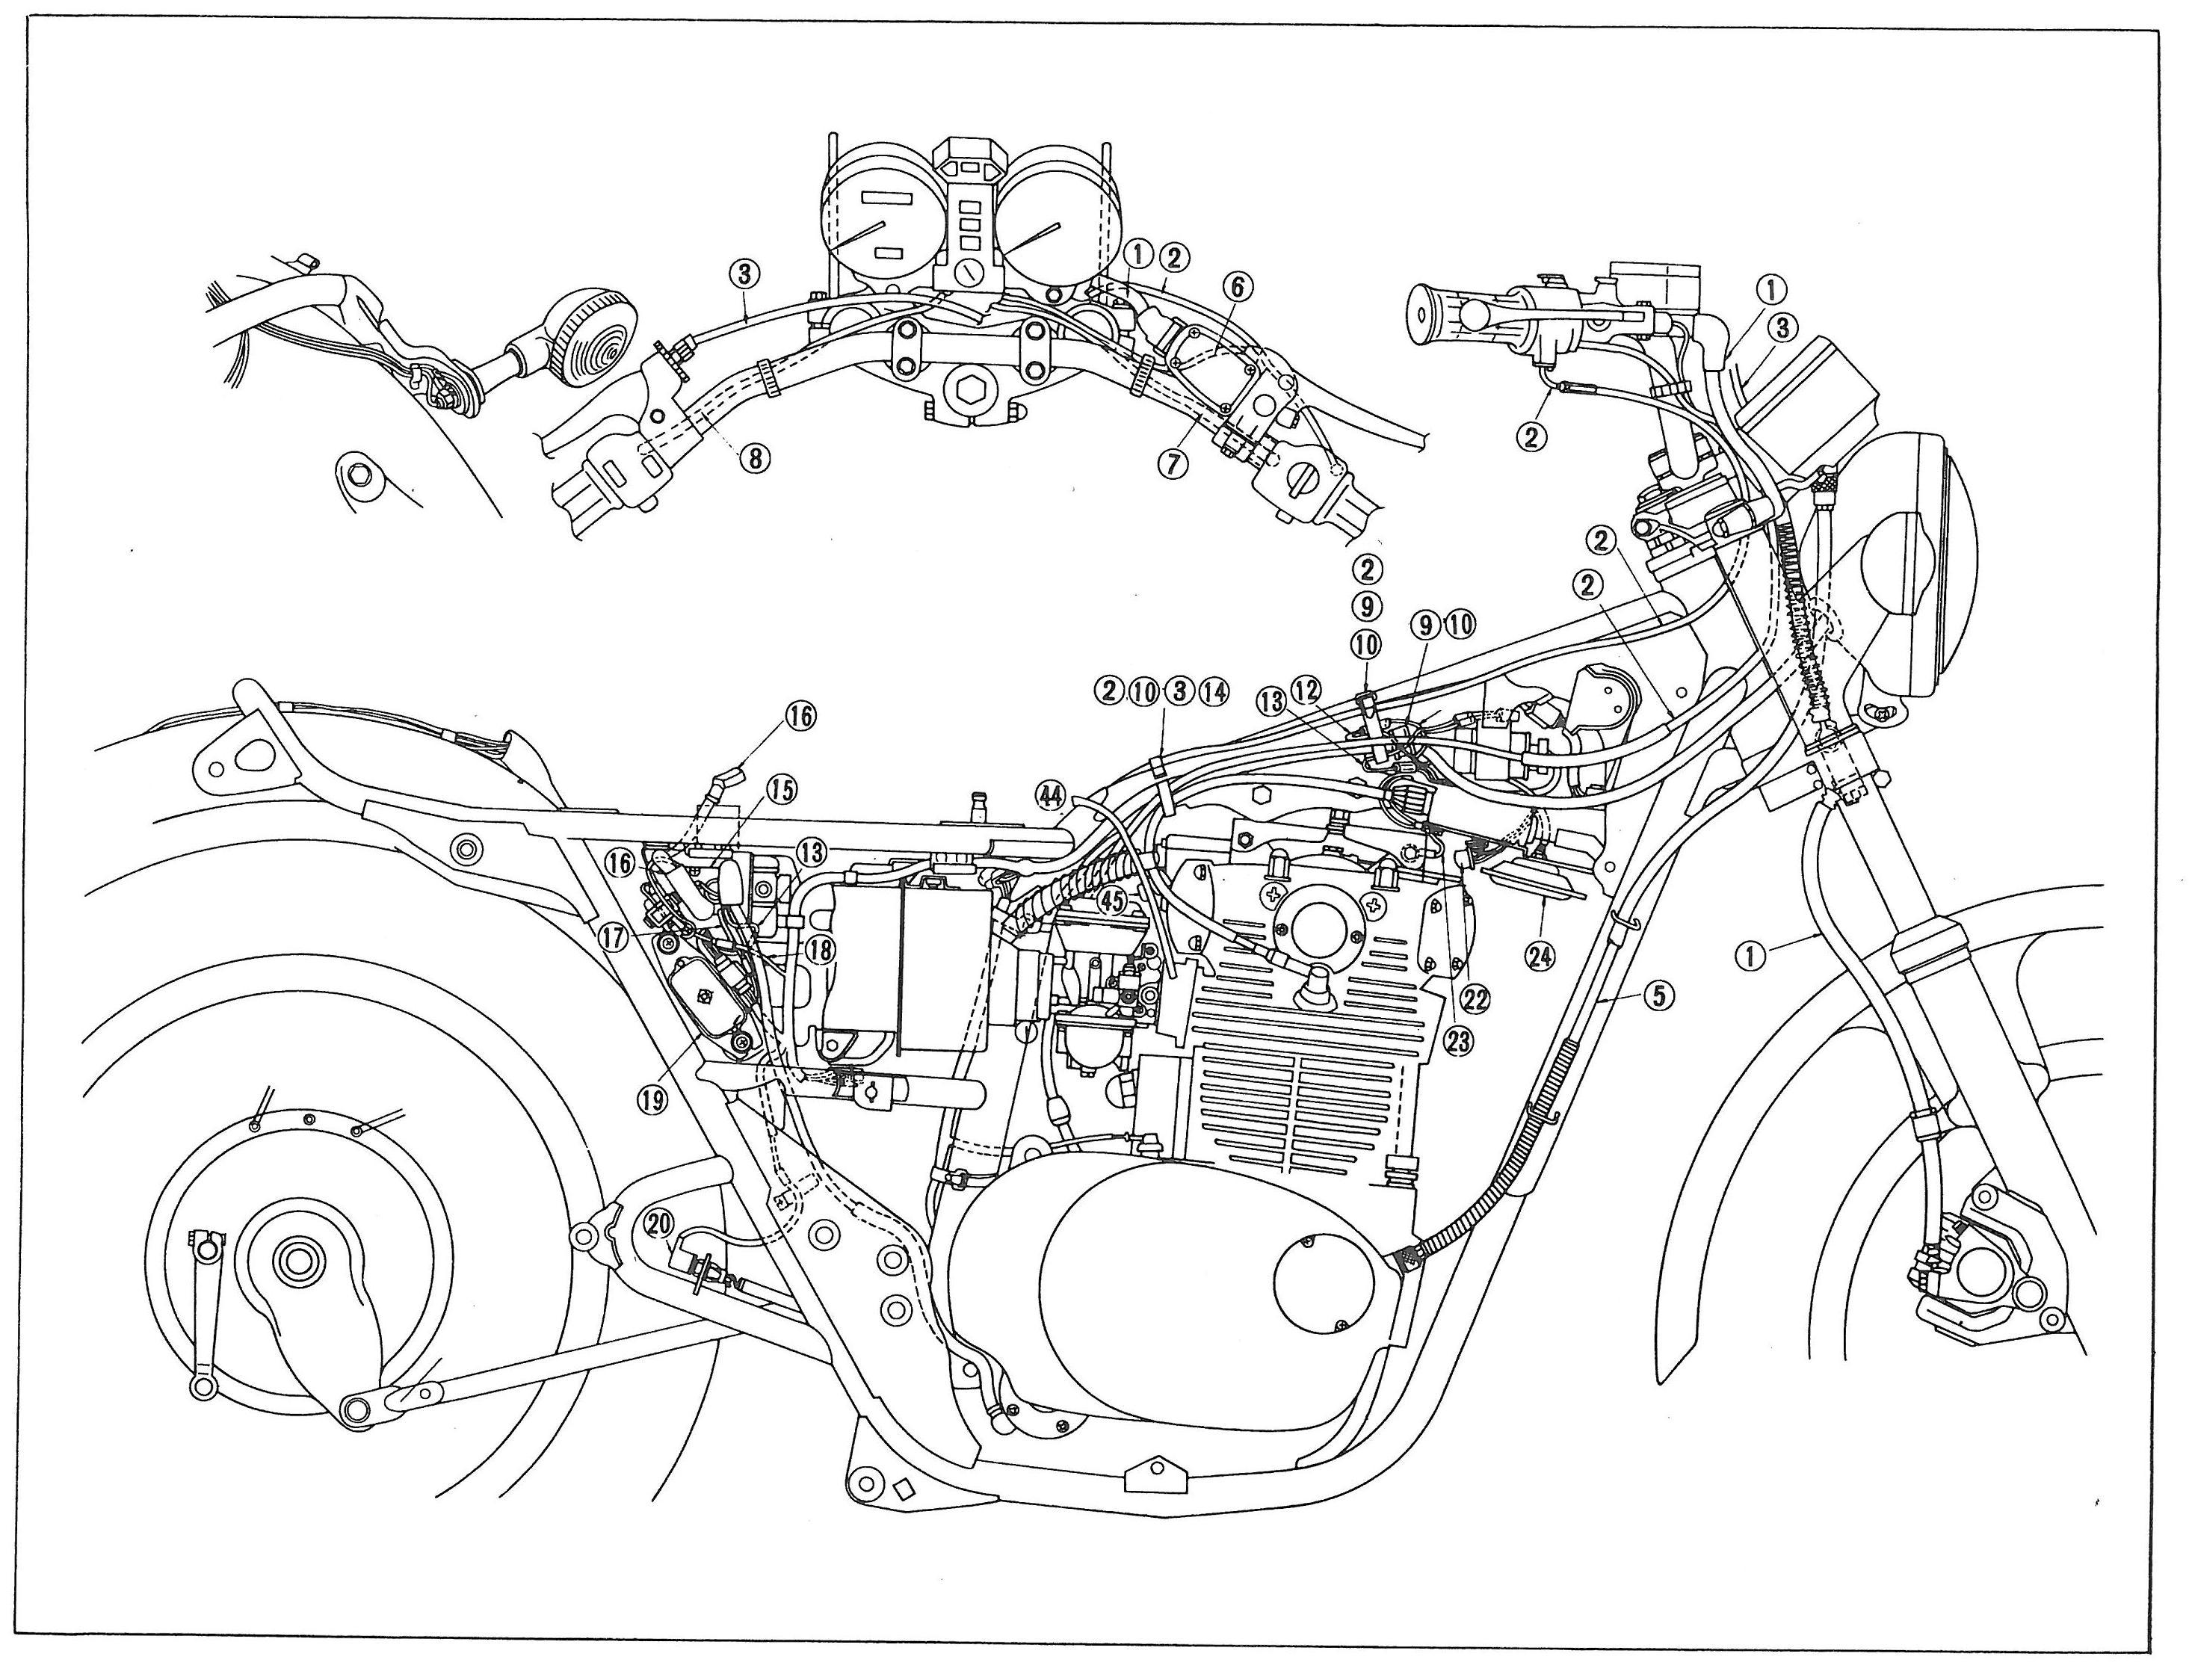 medium resolution of 1981 xs650 engine diagram wiring diagram used 1981 xs650 engine diagram